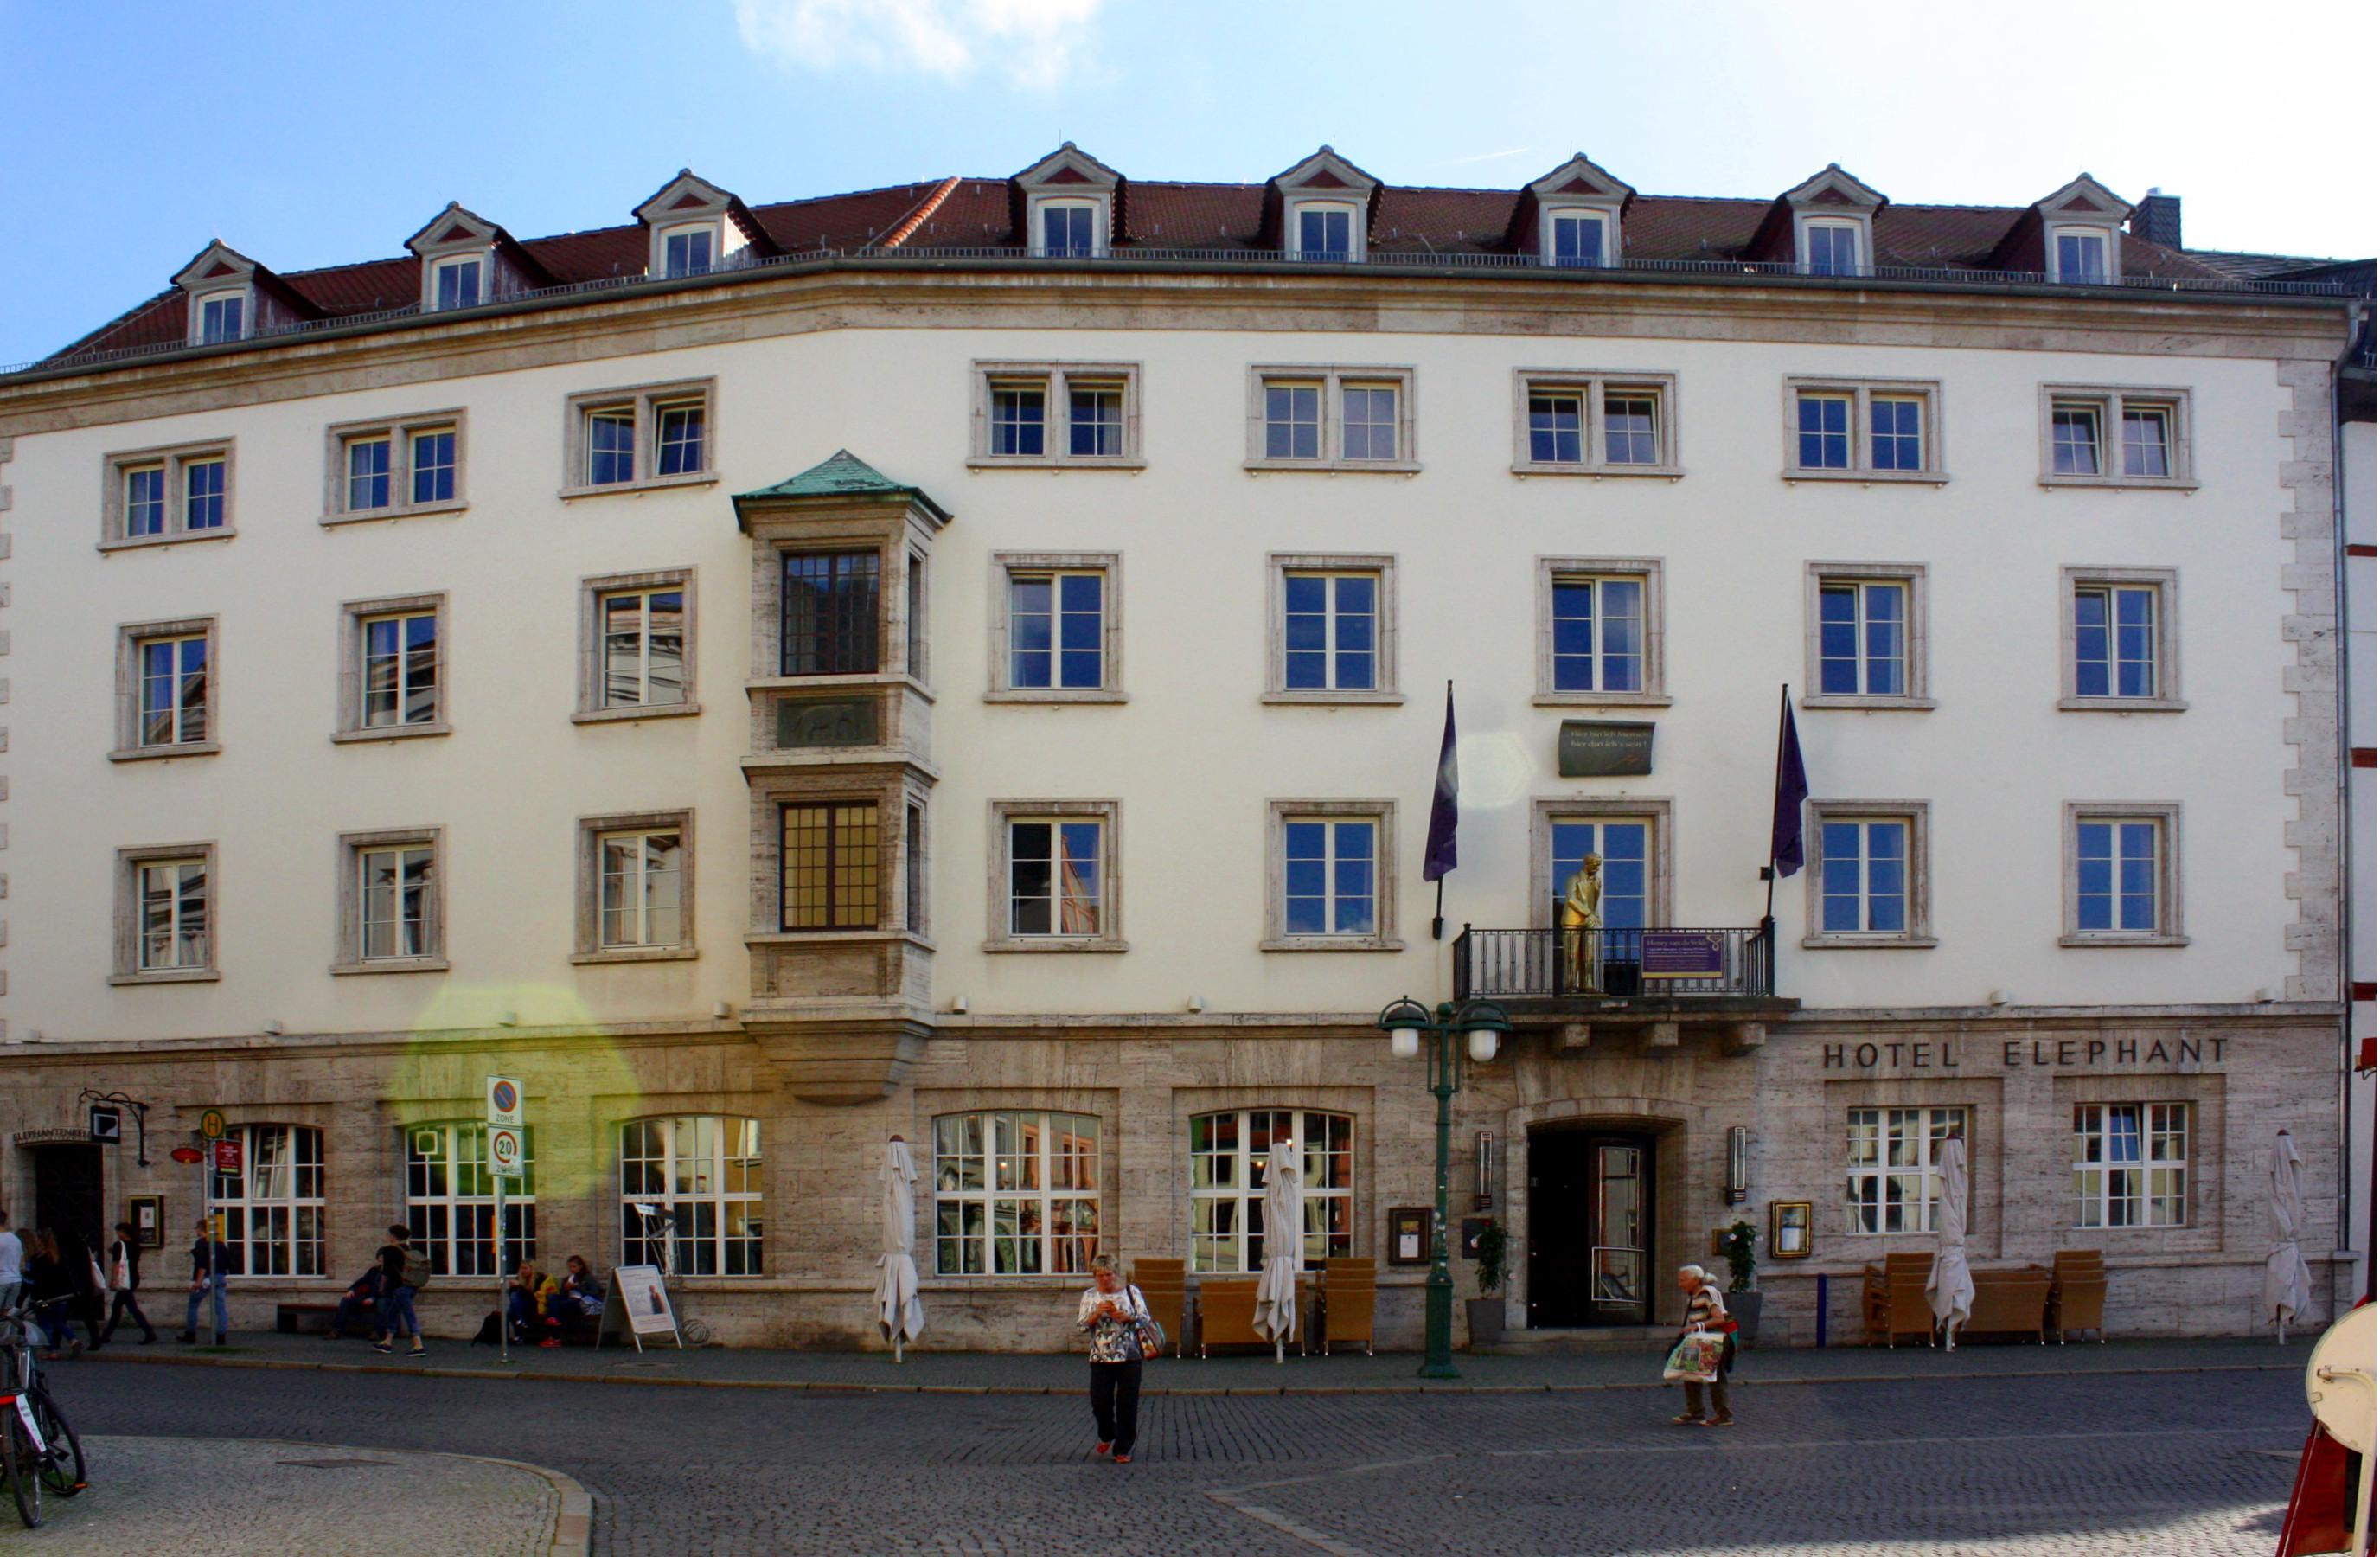 File:Hotel Elephant Markt 18 Weimar.jpg - Wikimedia Commons  File:Hotel Elep...